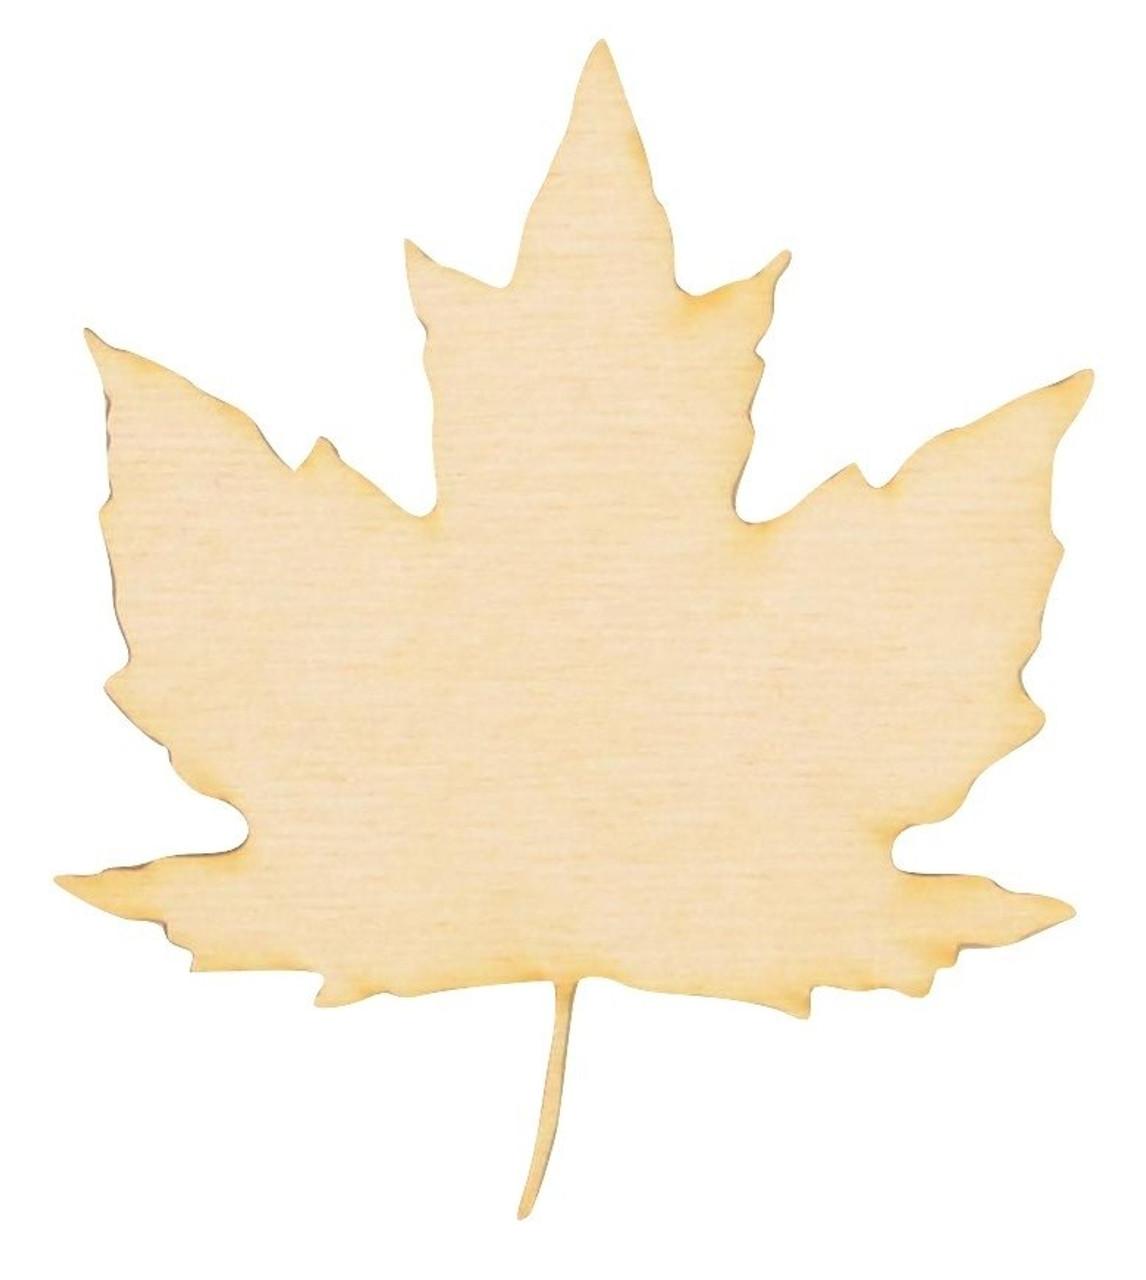 8 Inch Handmade Maple Leaf White